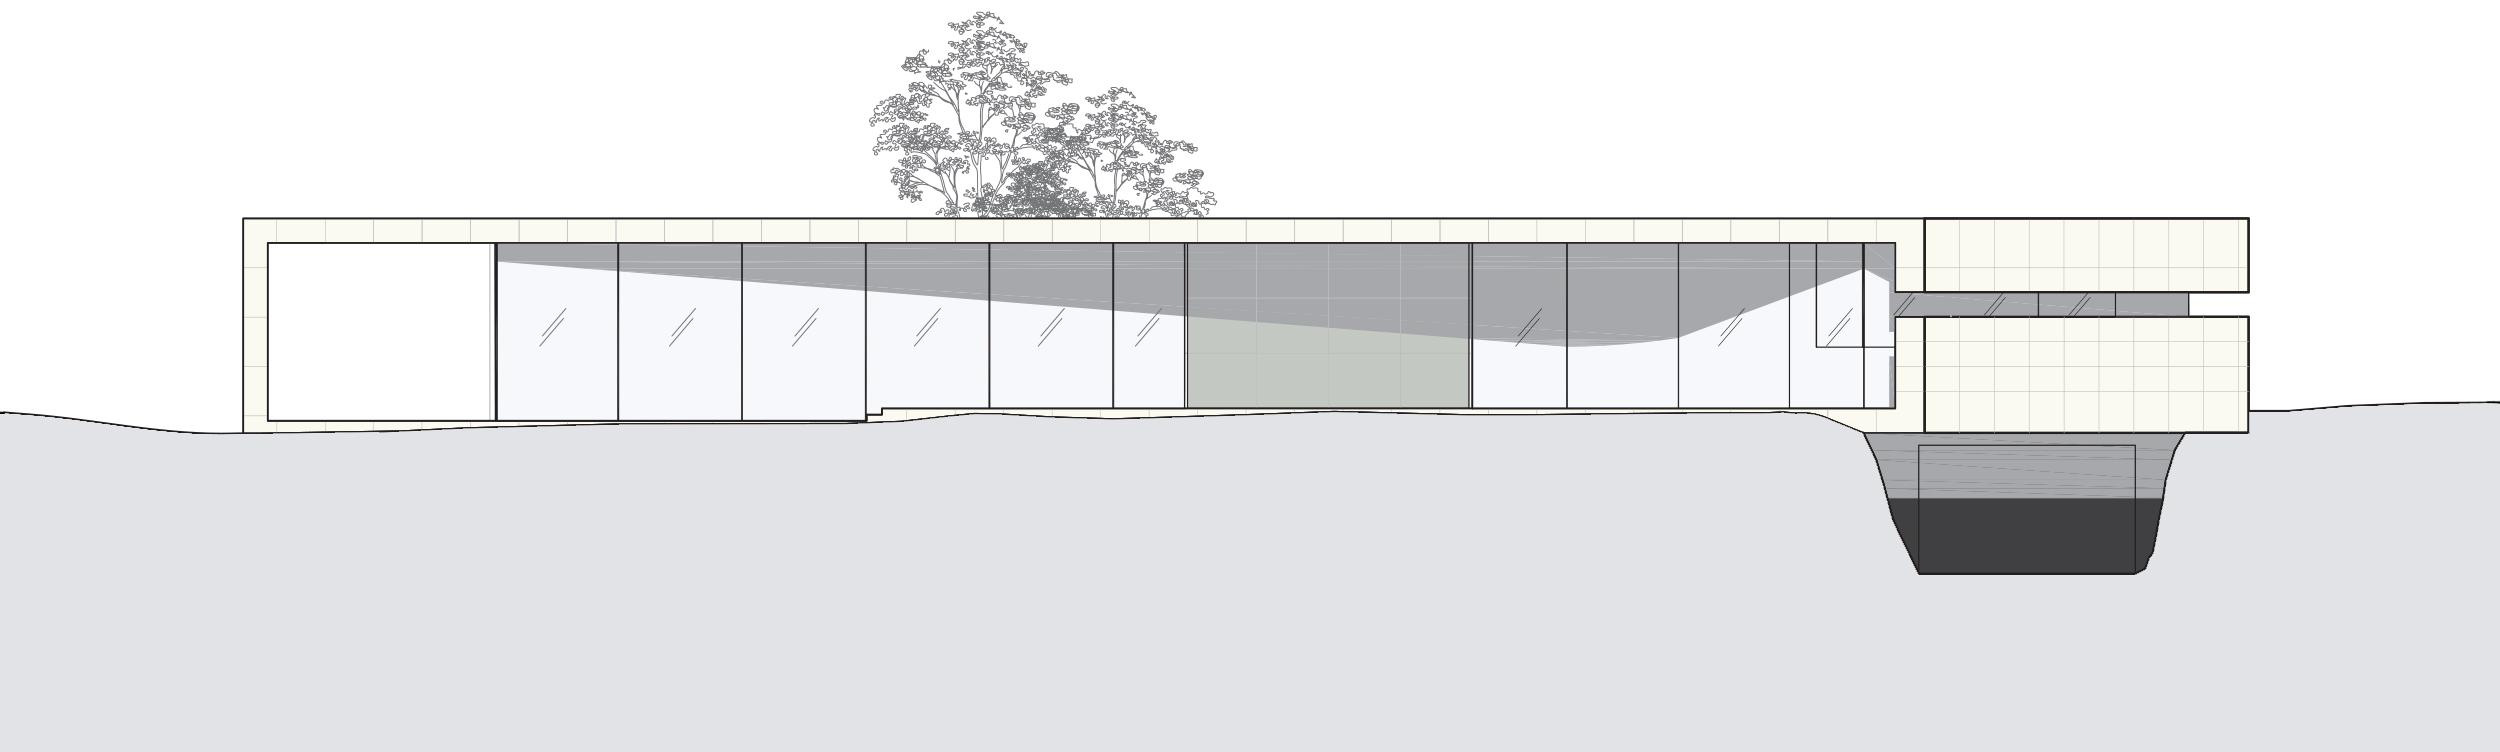 Villa 1 - South